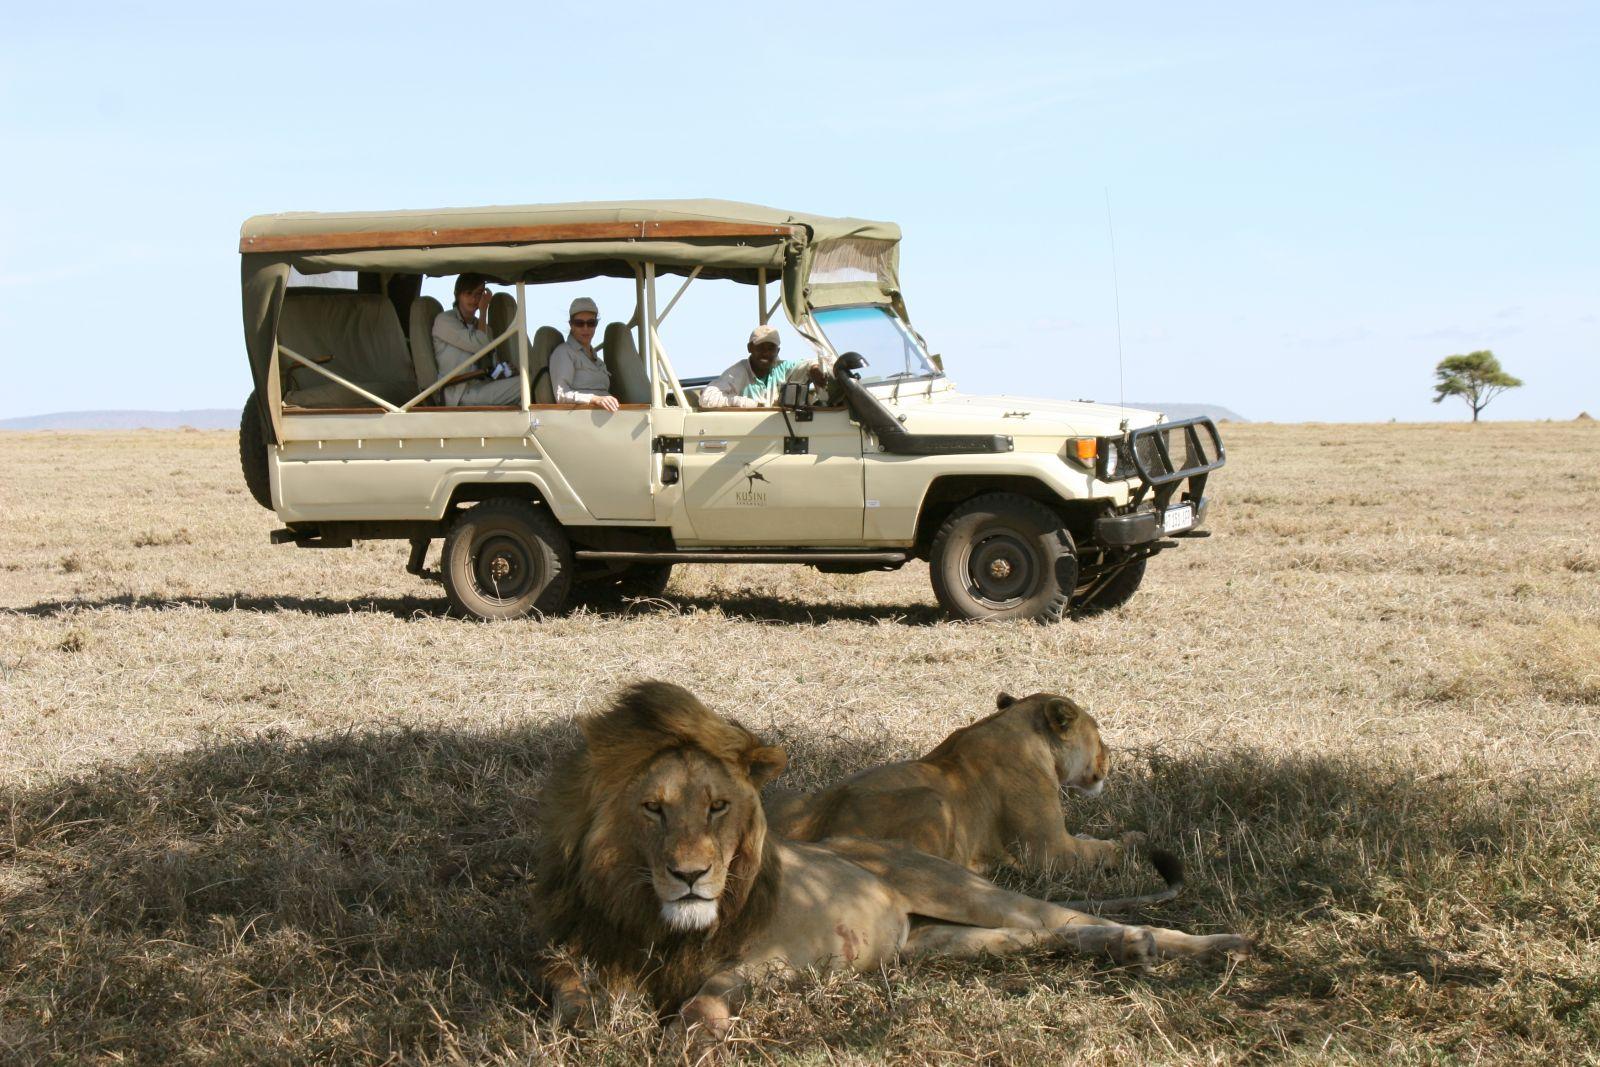 Hotels Safari Lodges Marketing Tanzania Tours Travel